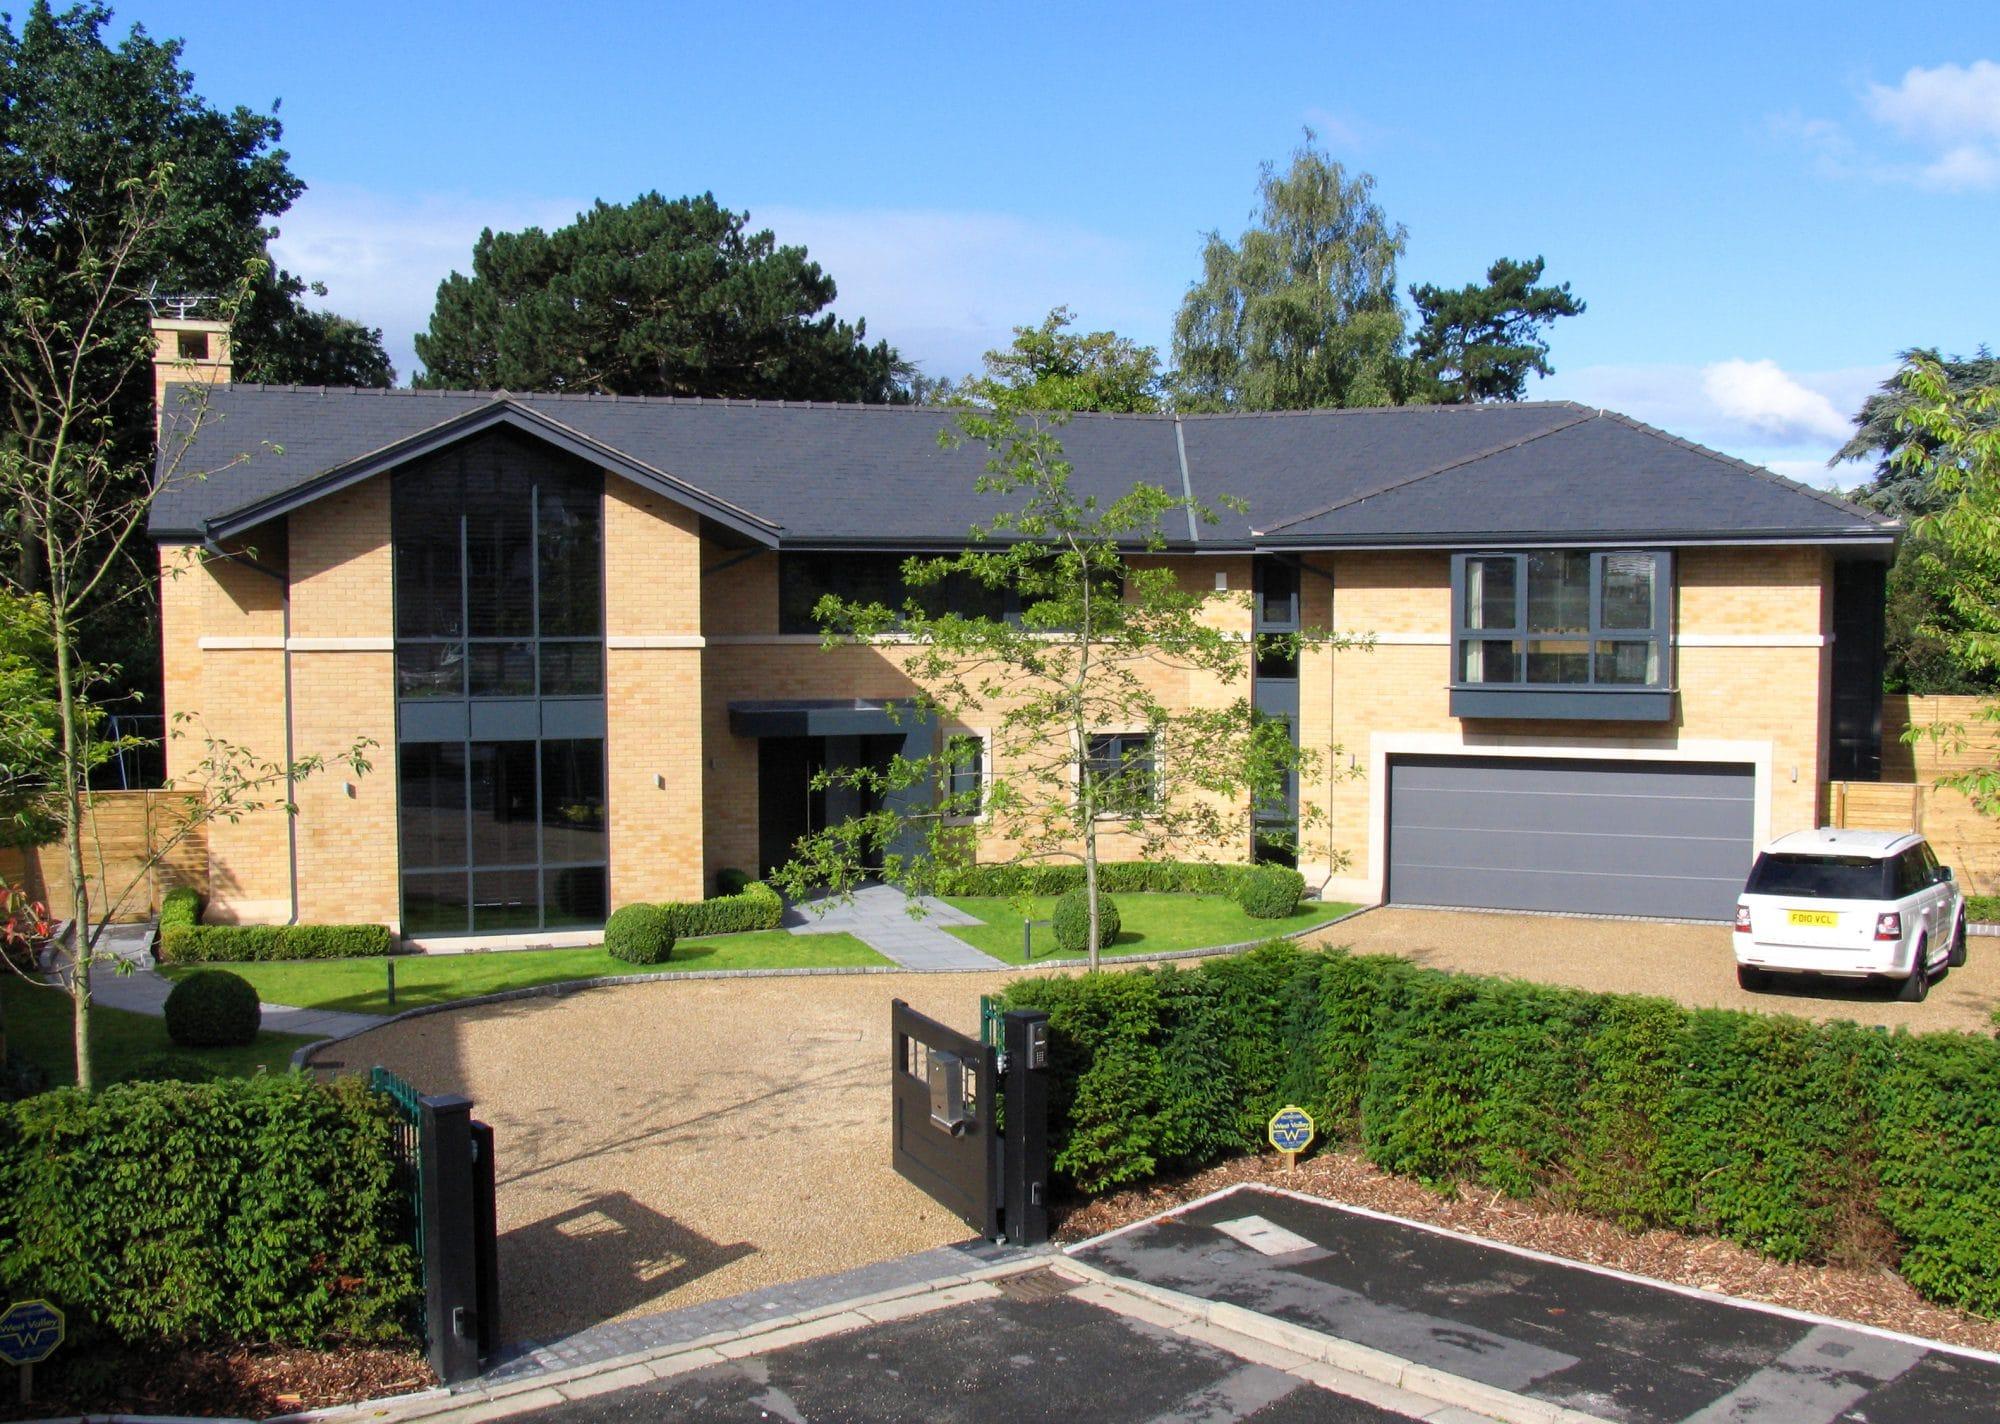 9 Pinewood, Bowdon, Cheshire